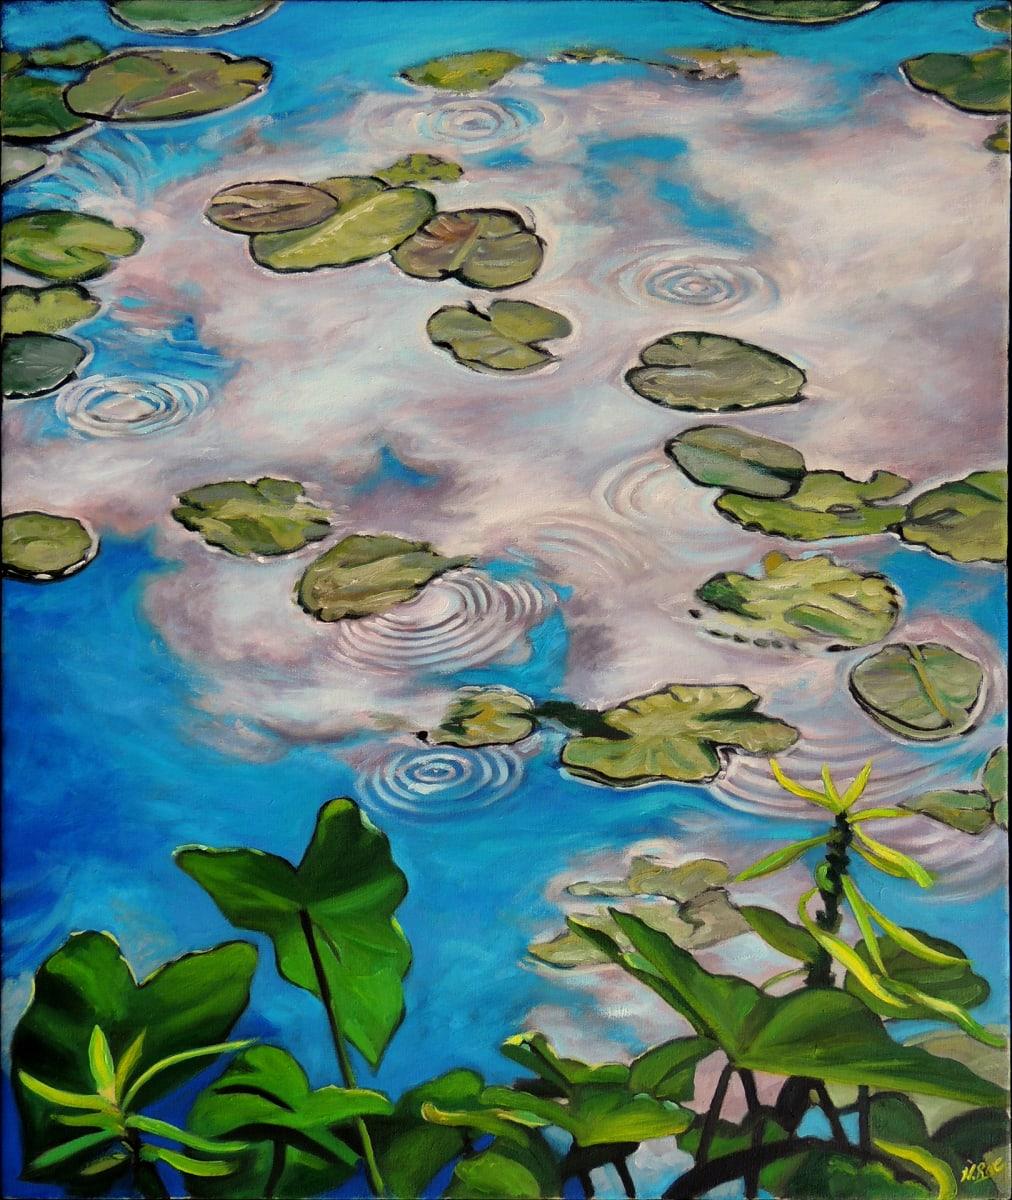 Tilt the sky by Herb Roe